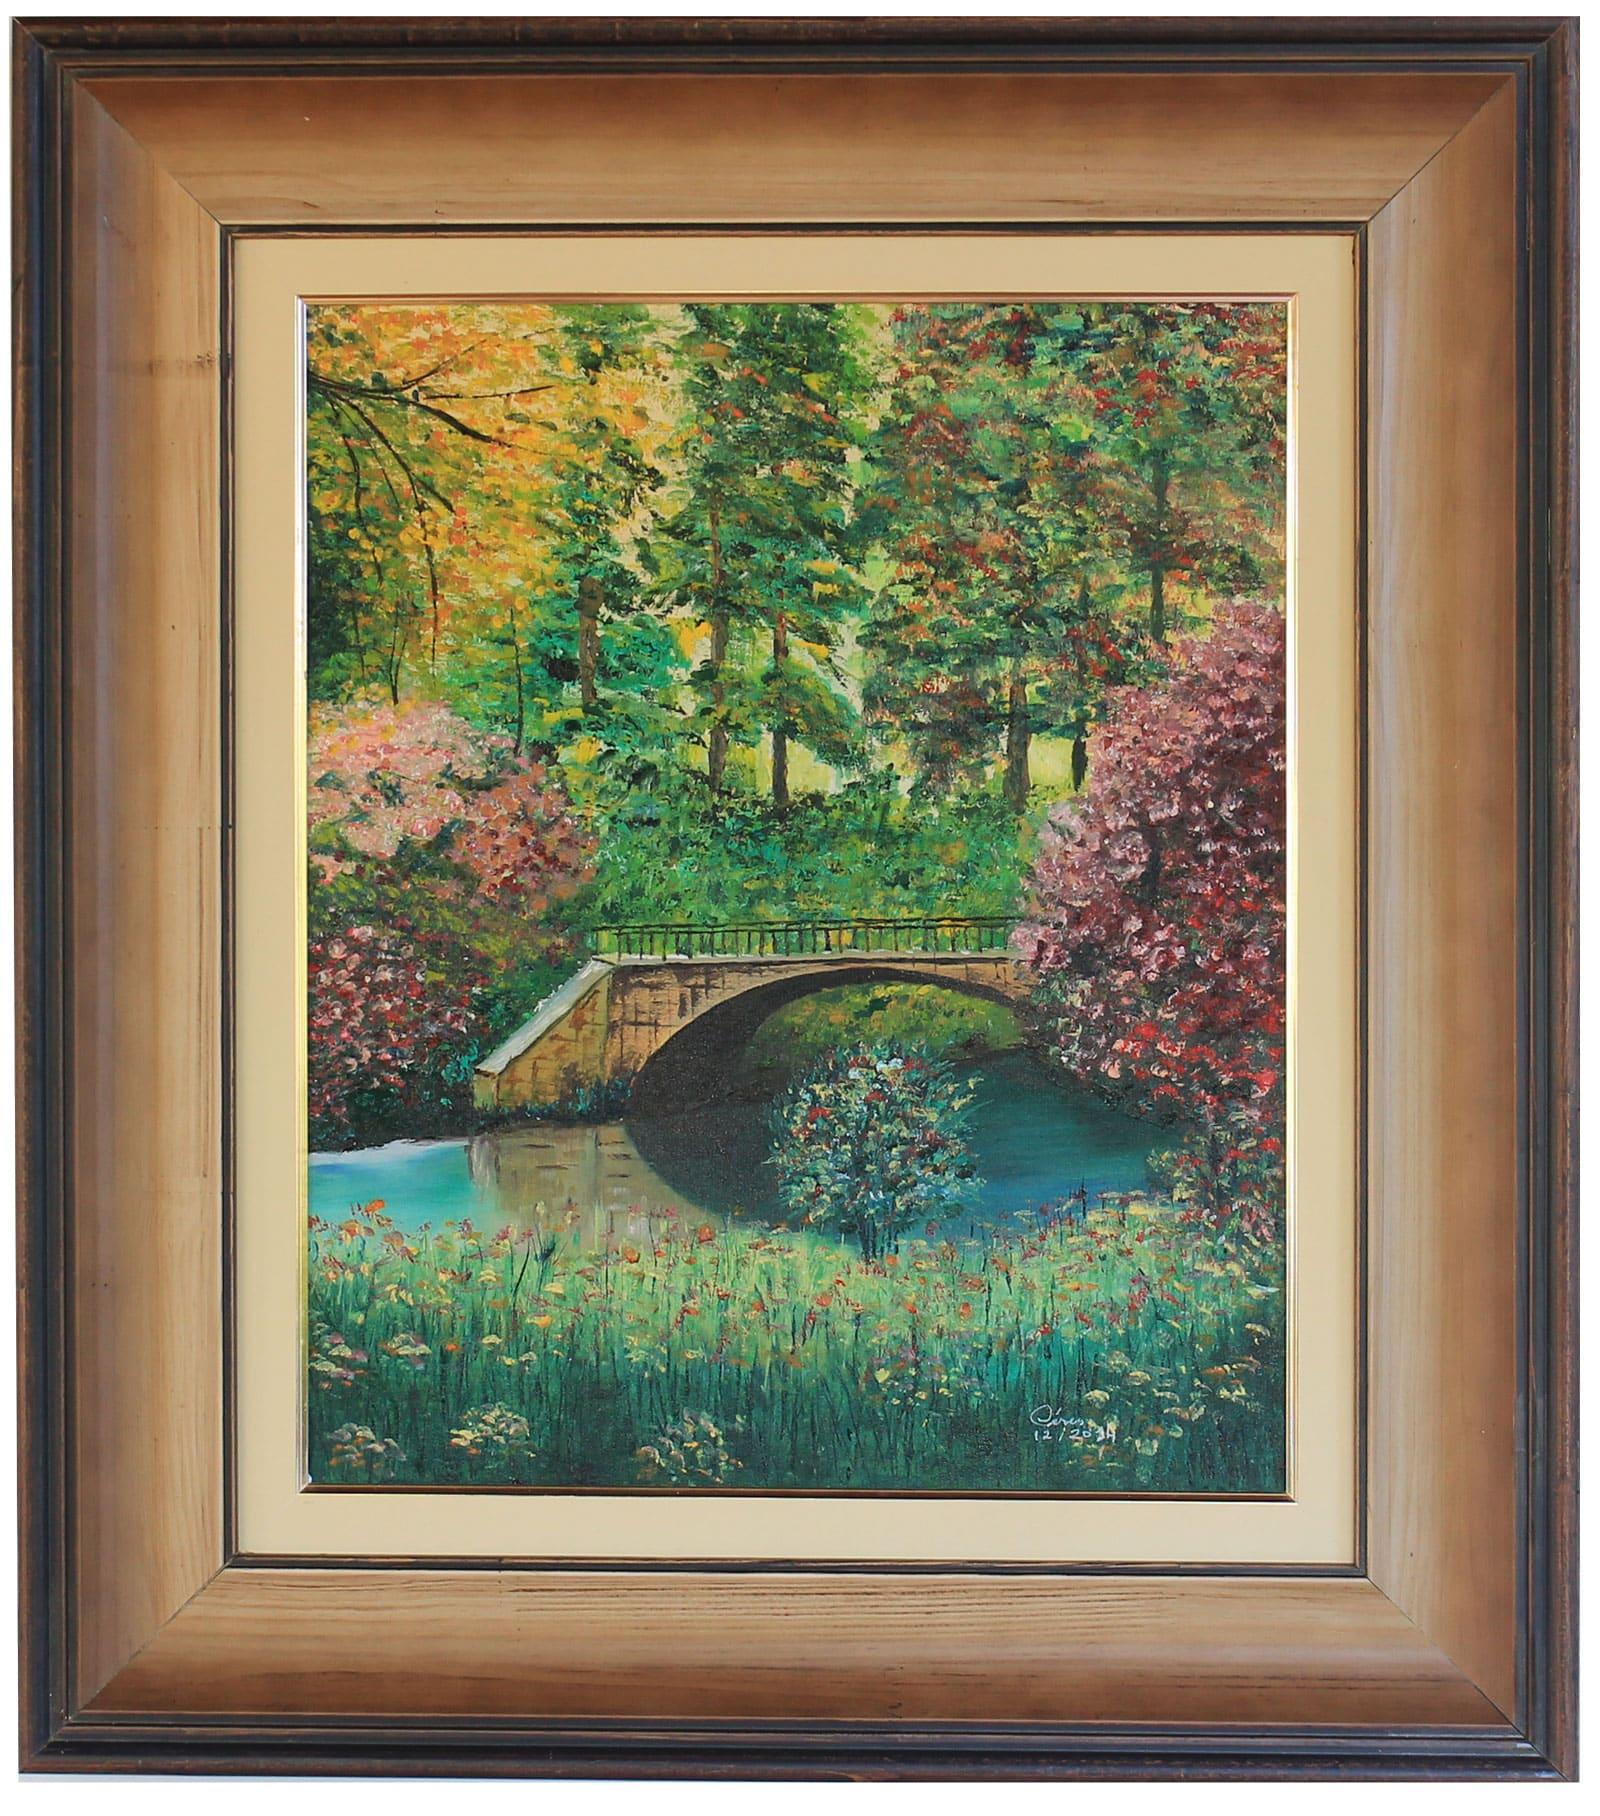 Jardim-de-Monet-artista-ceres-46x55